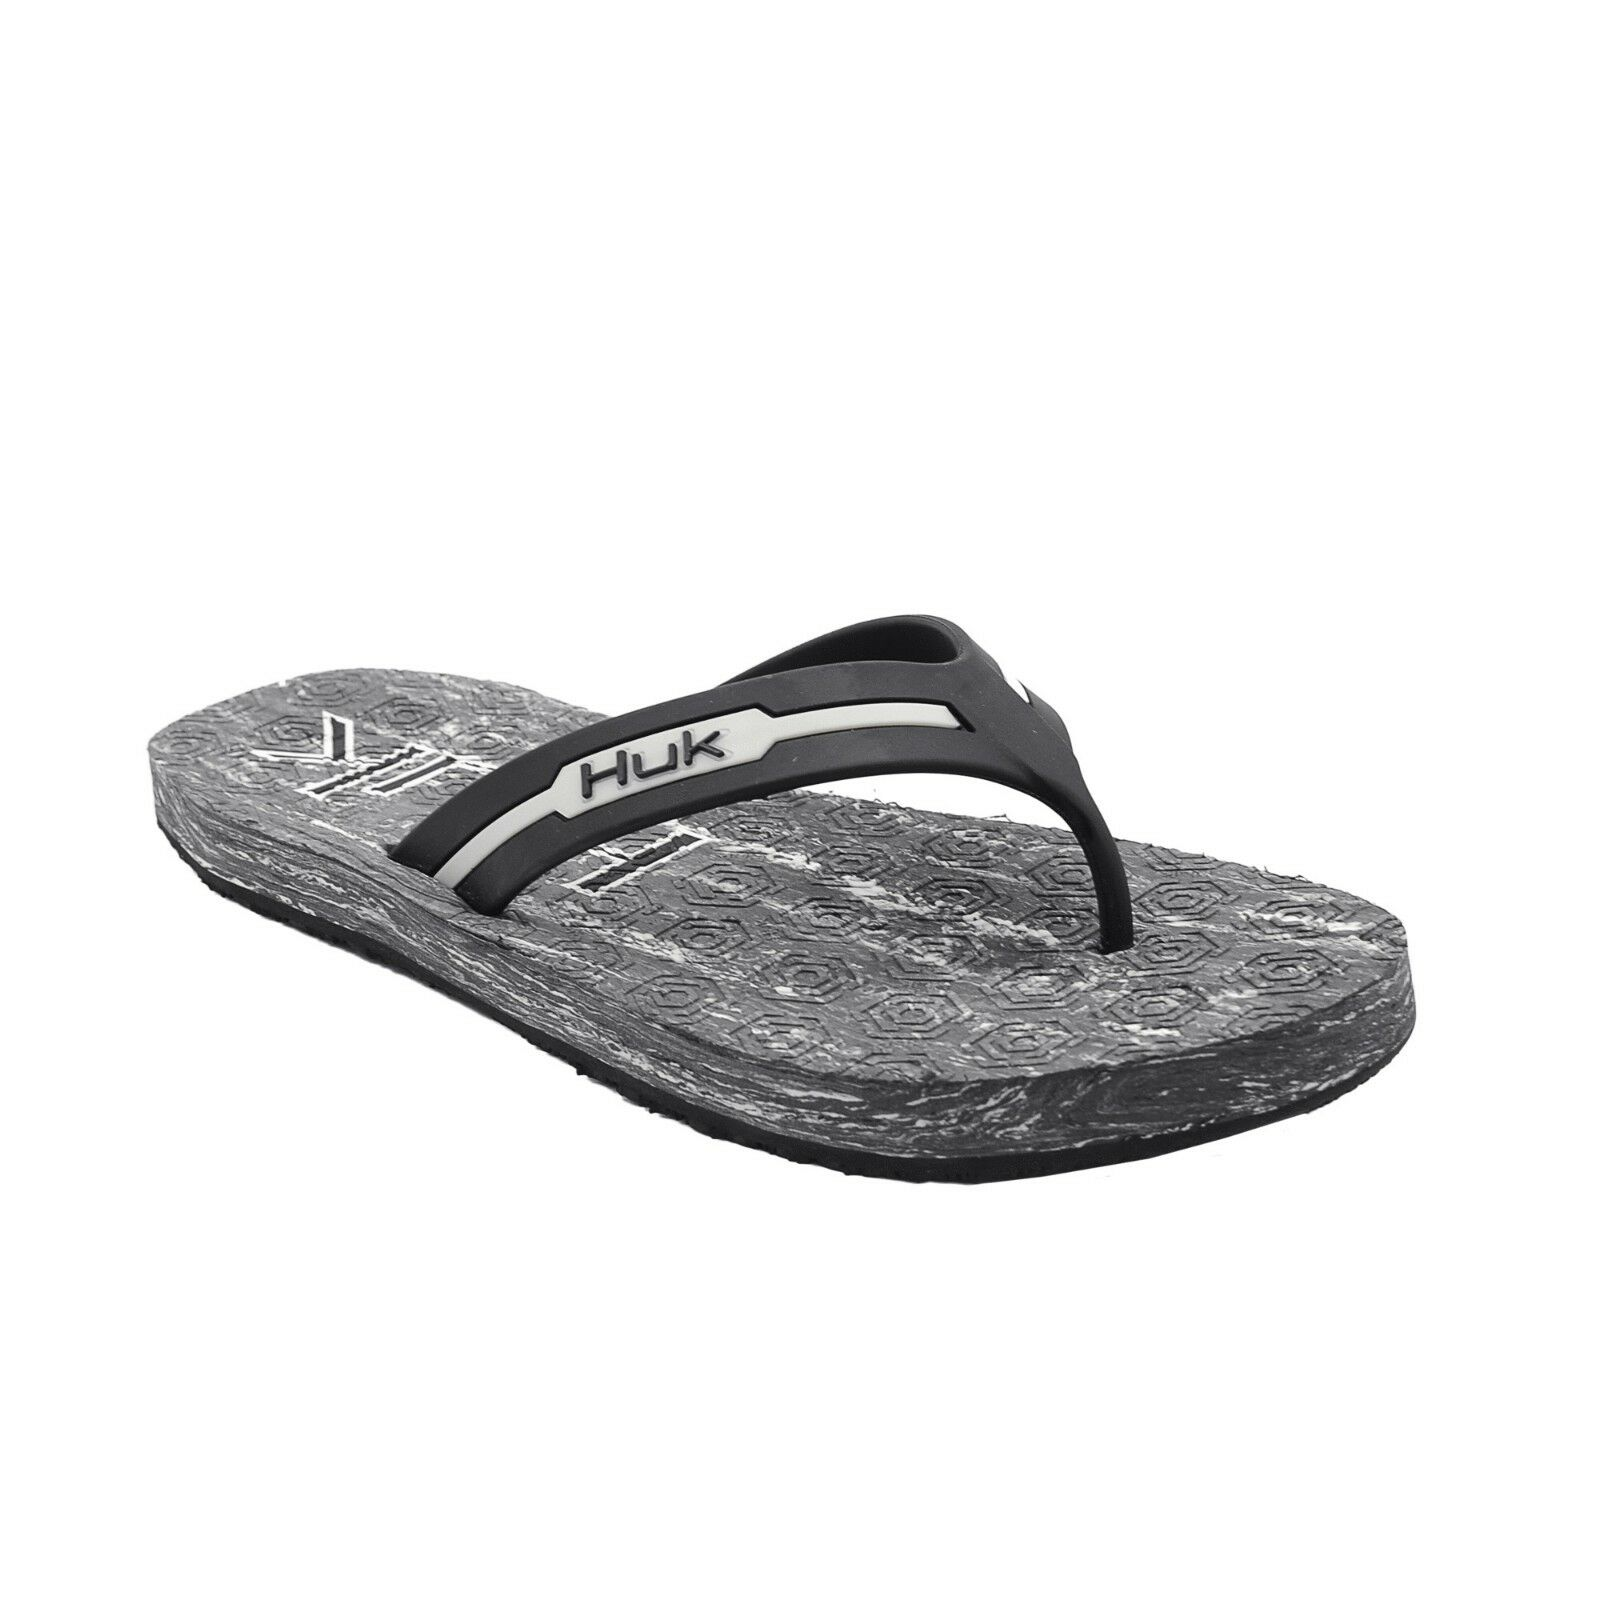 Huk Men's Matrix Flip Flop Fishing Sandals H8333100